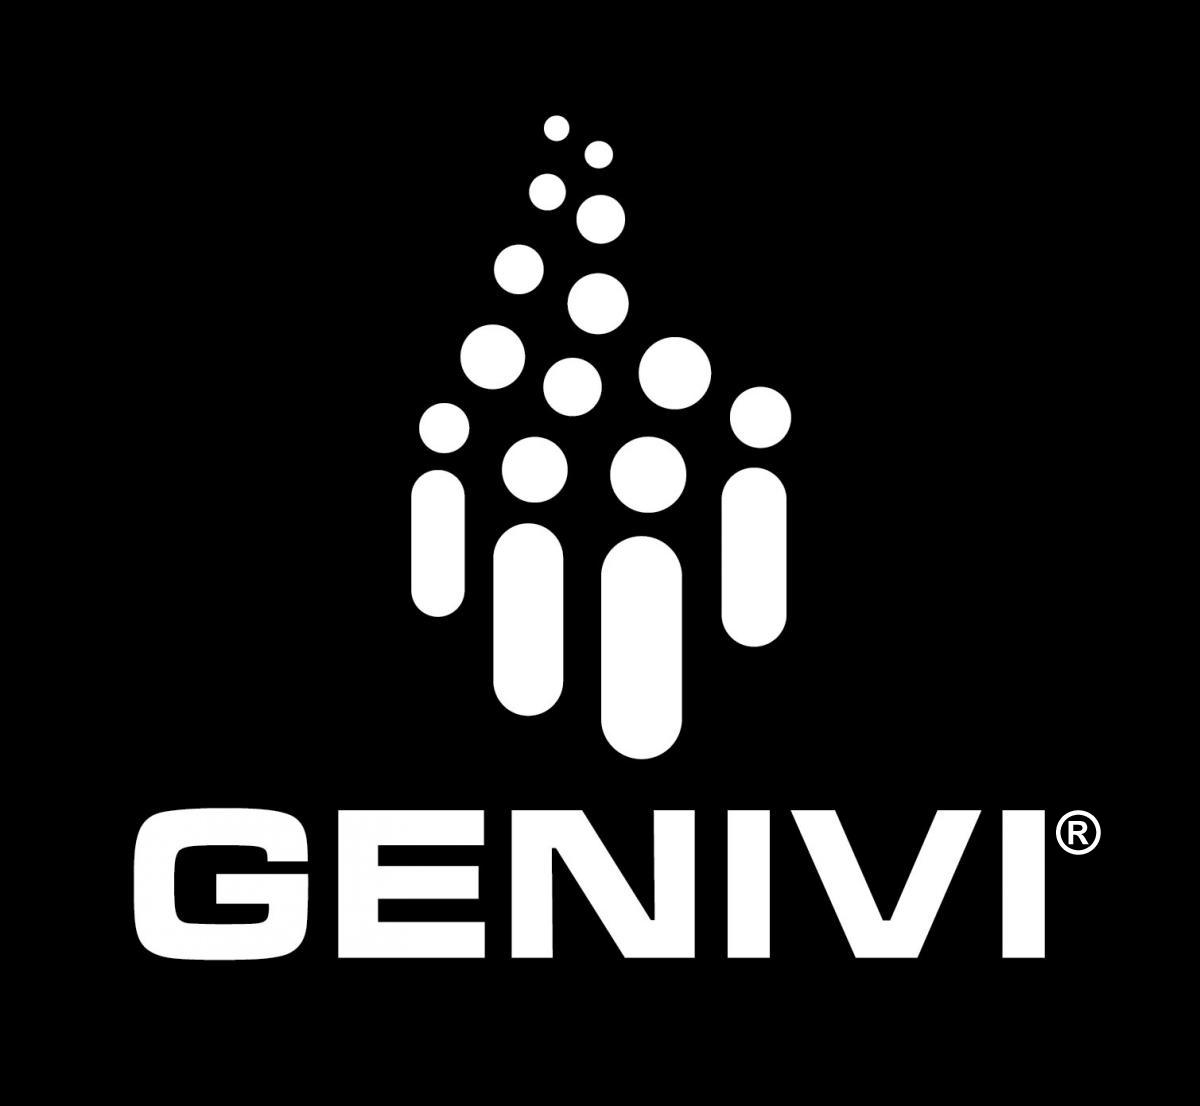 Genivi White Logo Black Background Jpg Kb X Download